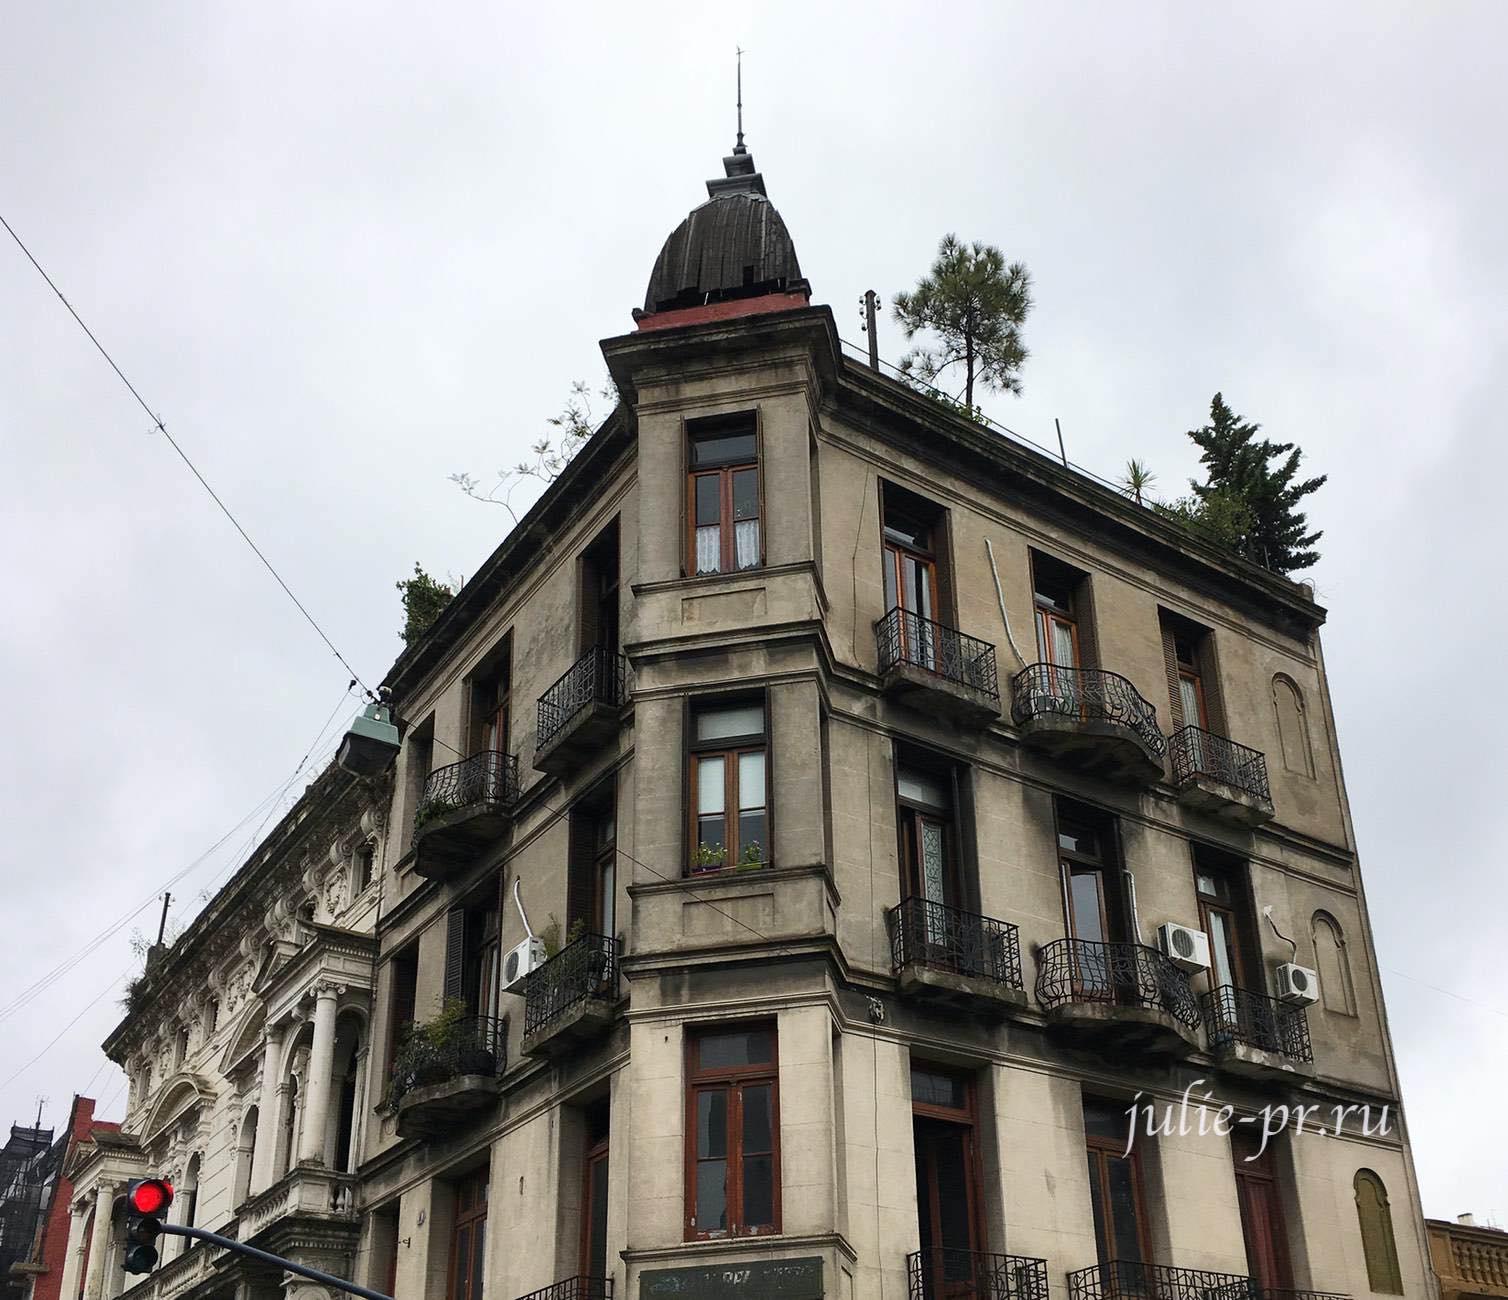 Аргентина, Буэнос-Айрес, Сан-Тельмо